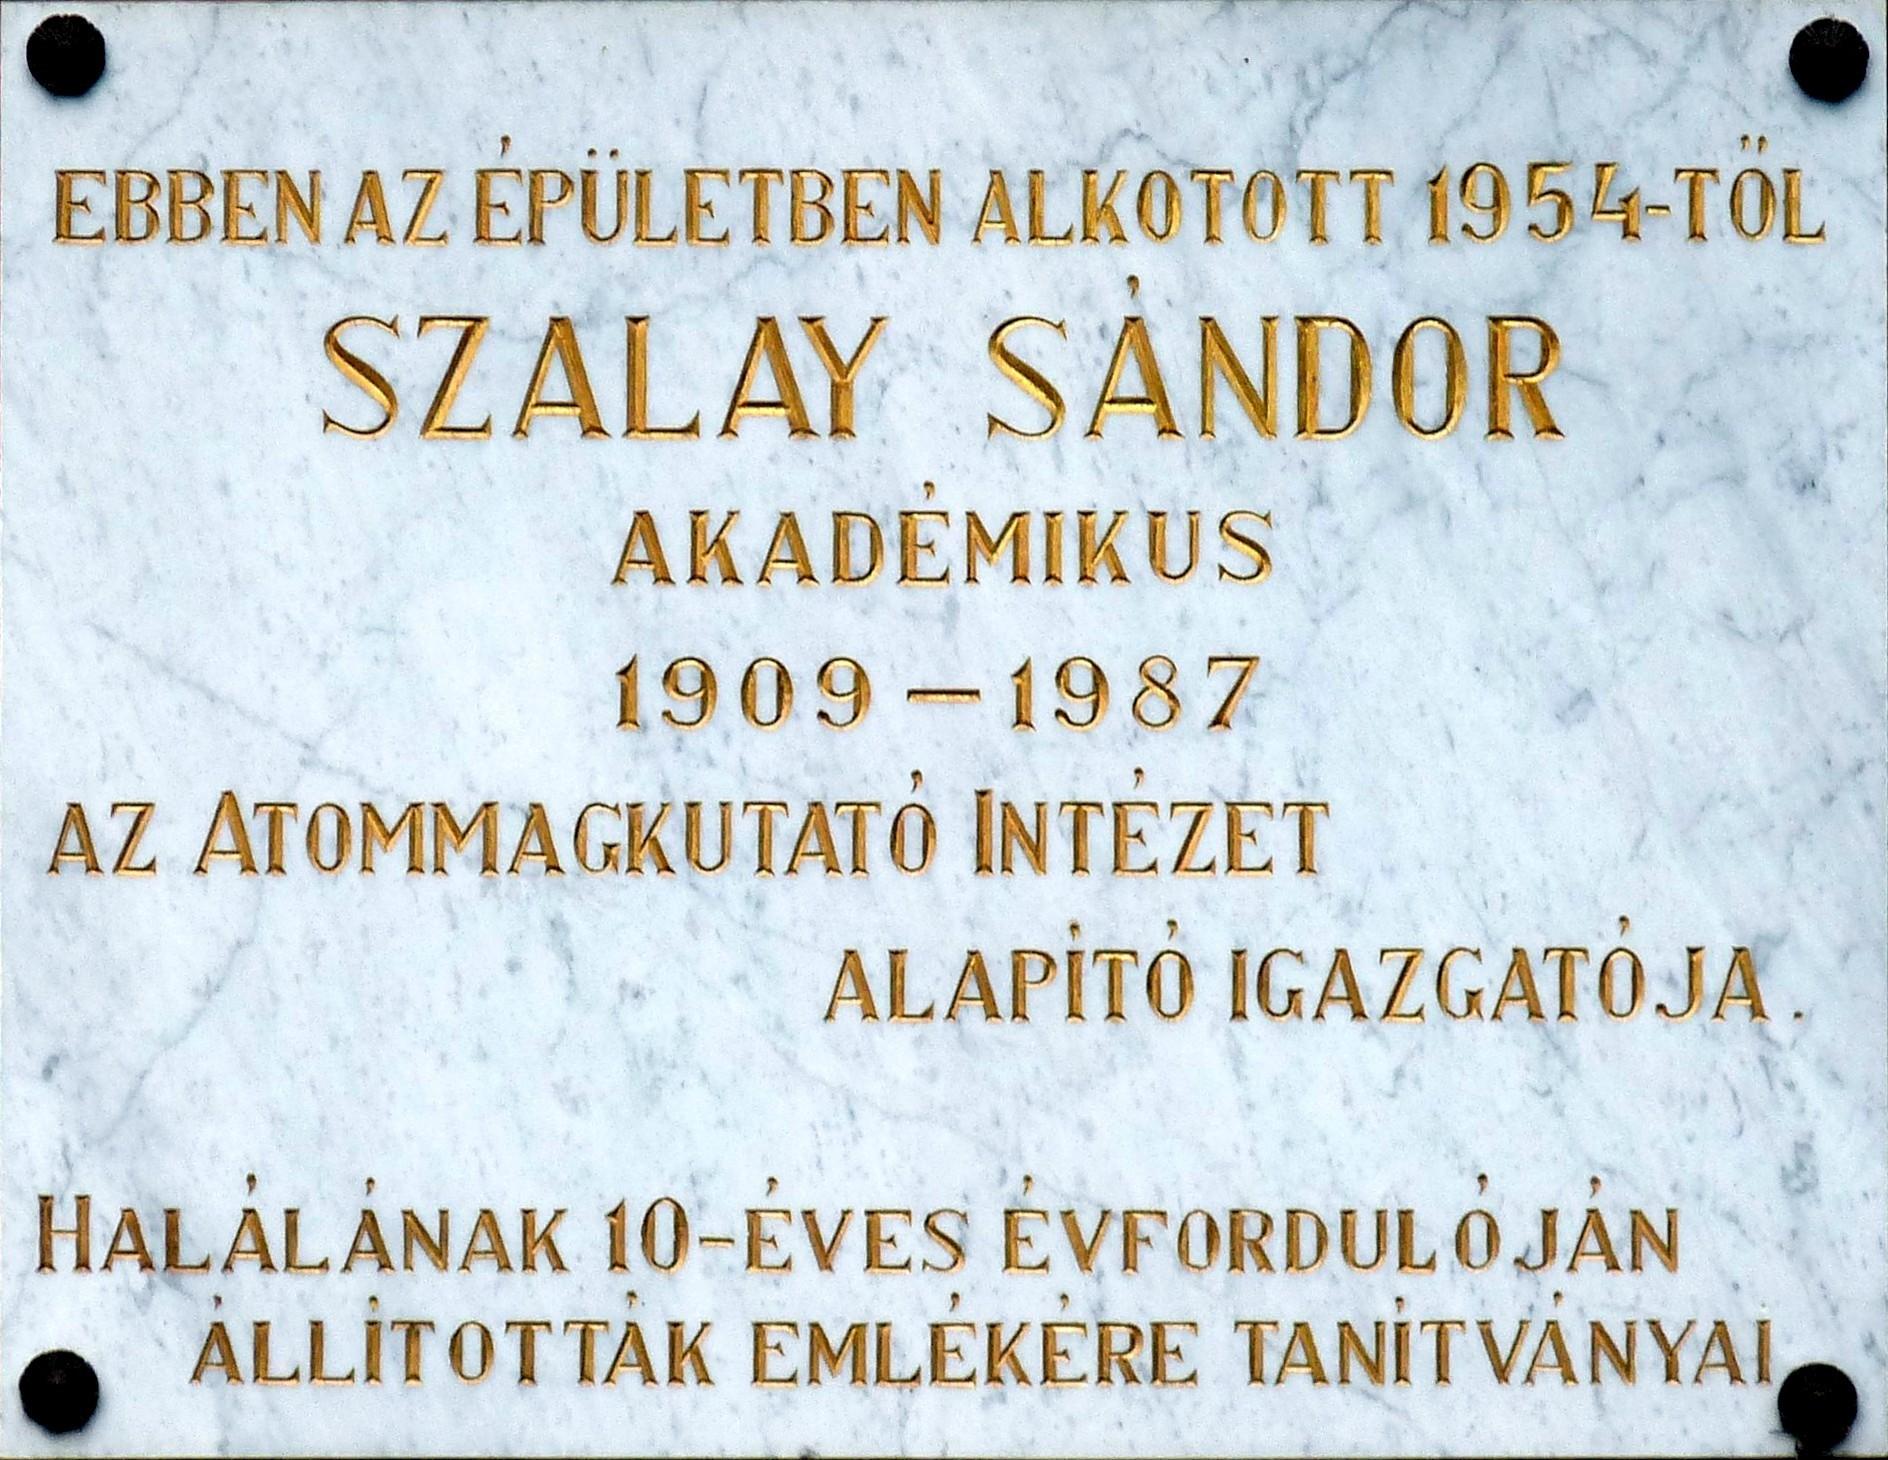 szalay_sandor_plaque_debrecen_bem_ter_18c.jpg